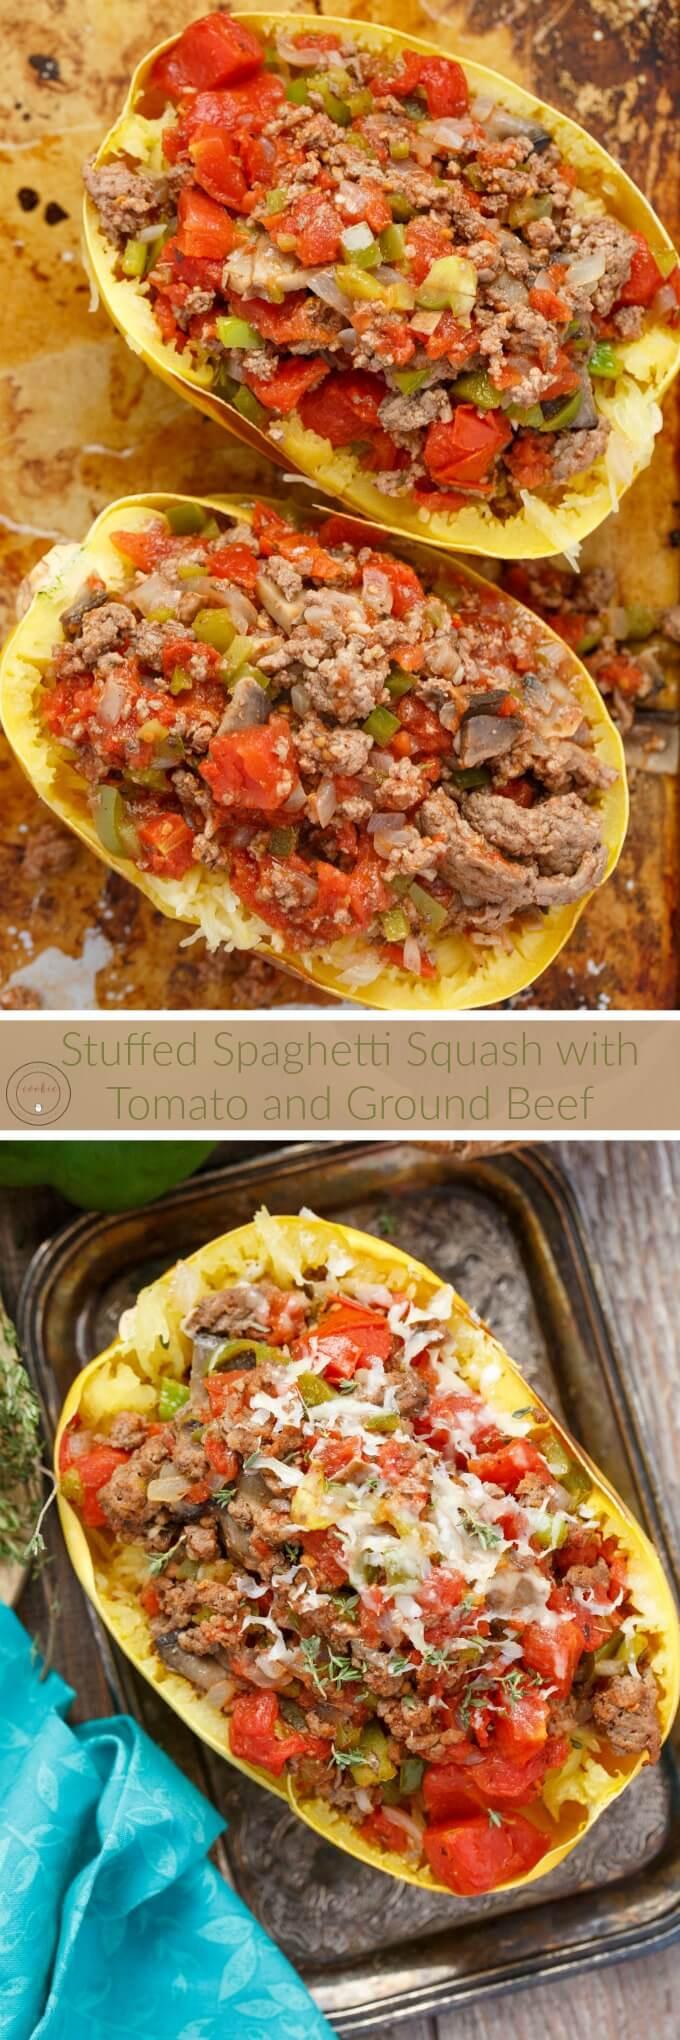 Summer Ground Beef Recipes  stuffed summer squash ground beef